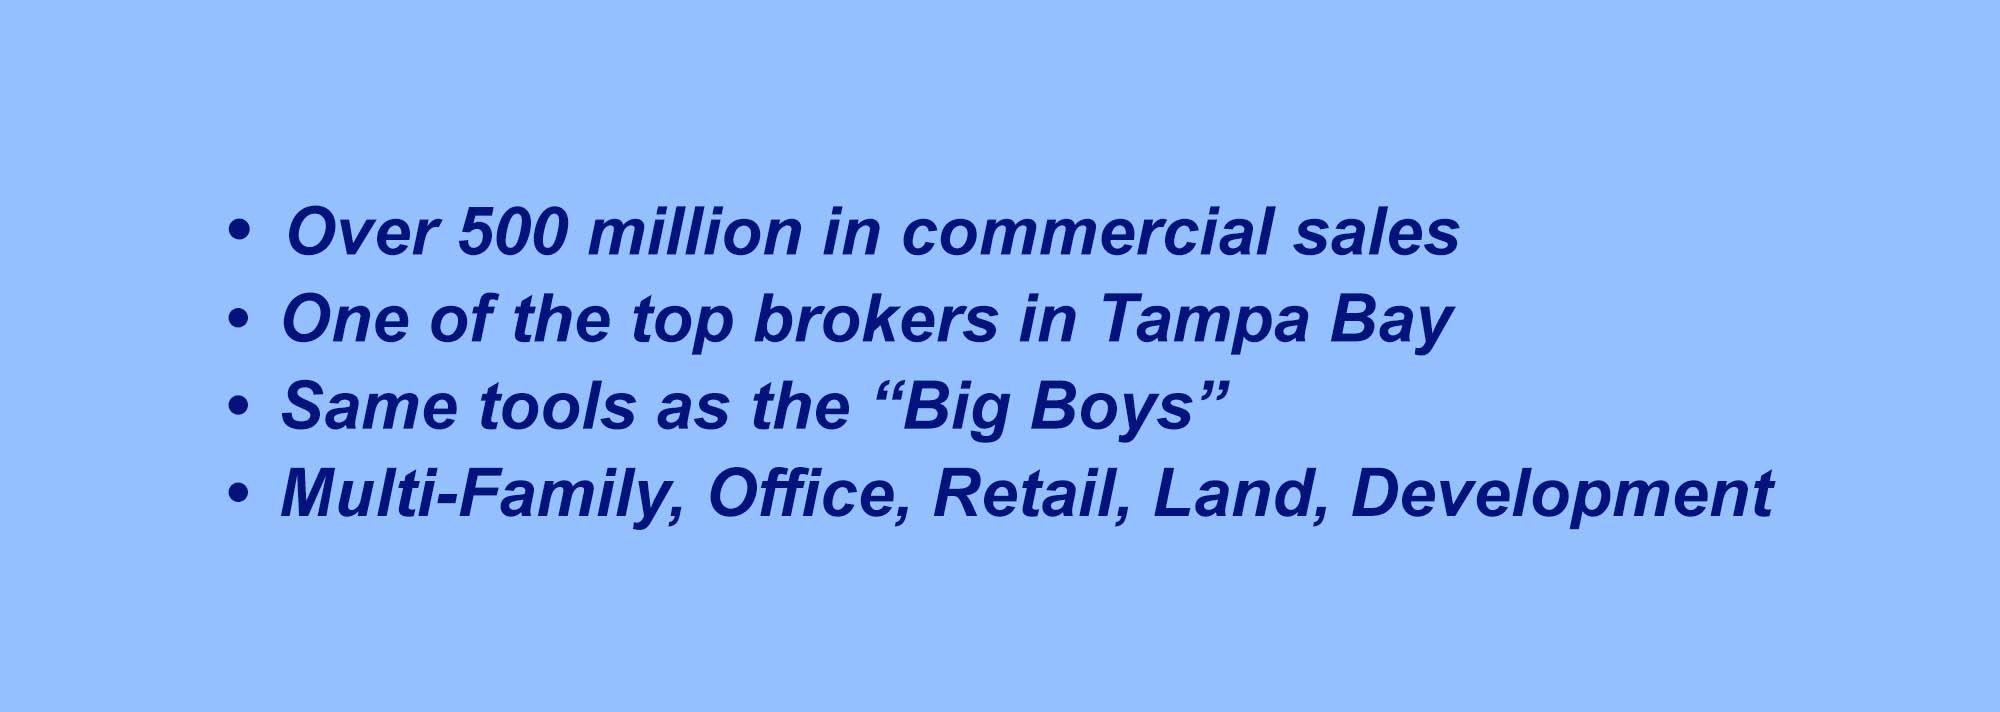 top brokers in Tampa Bay area